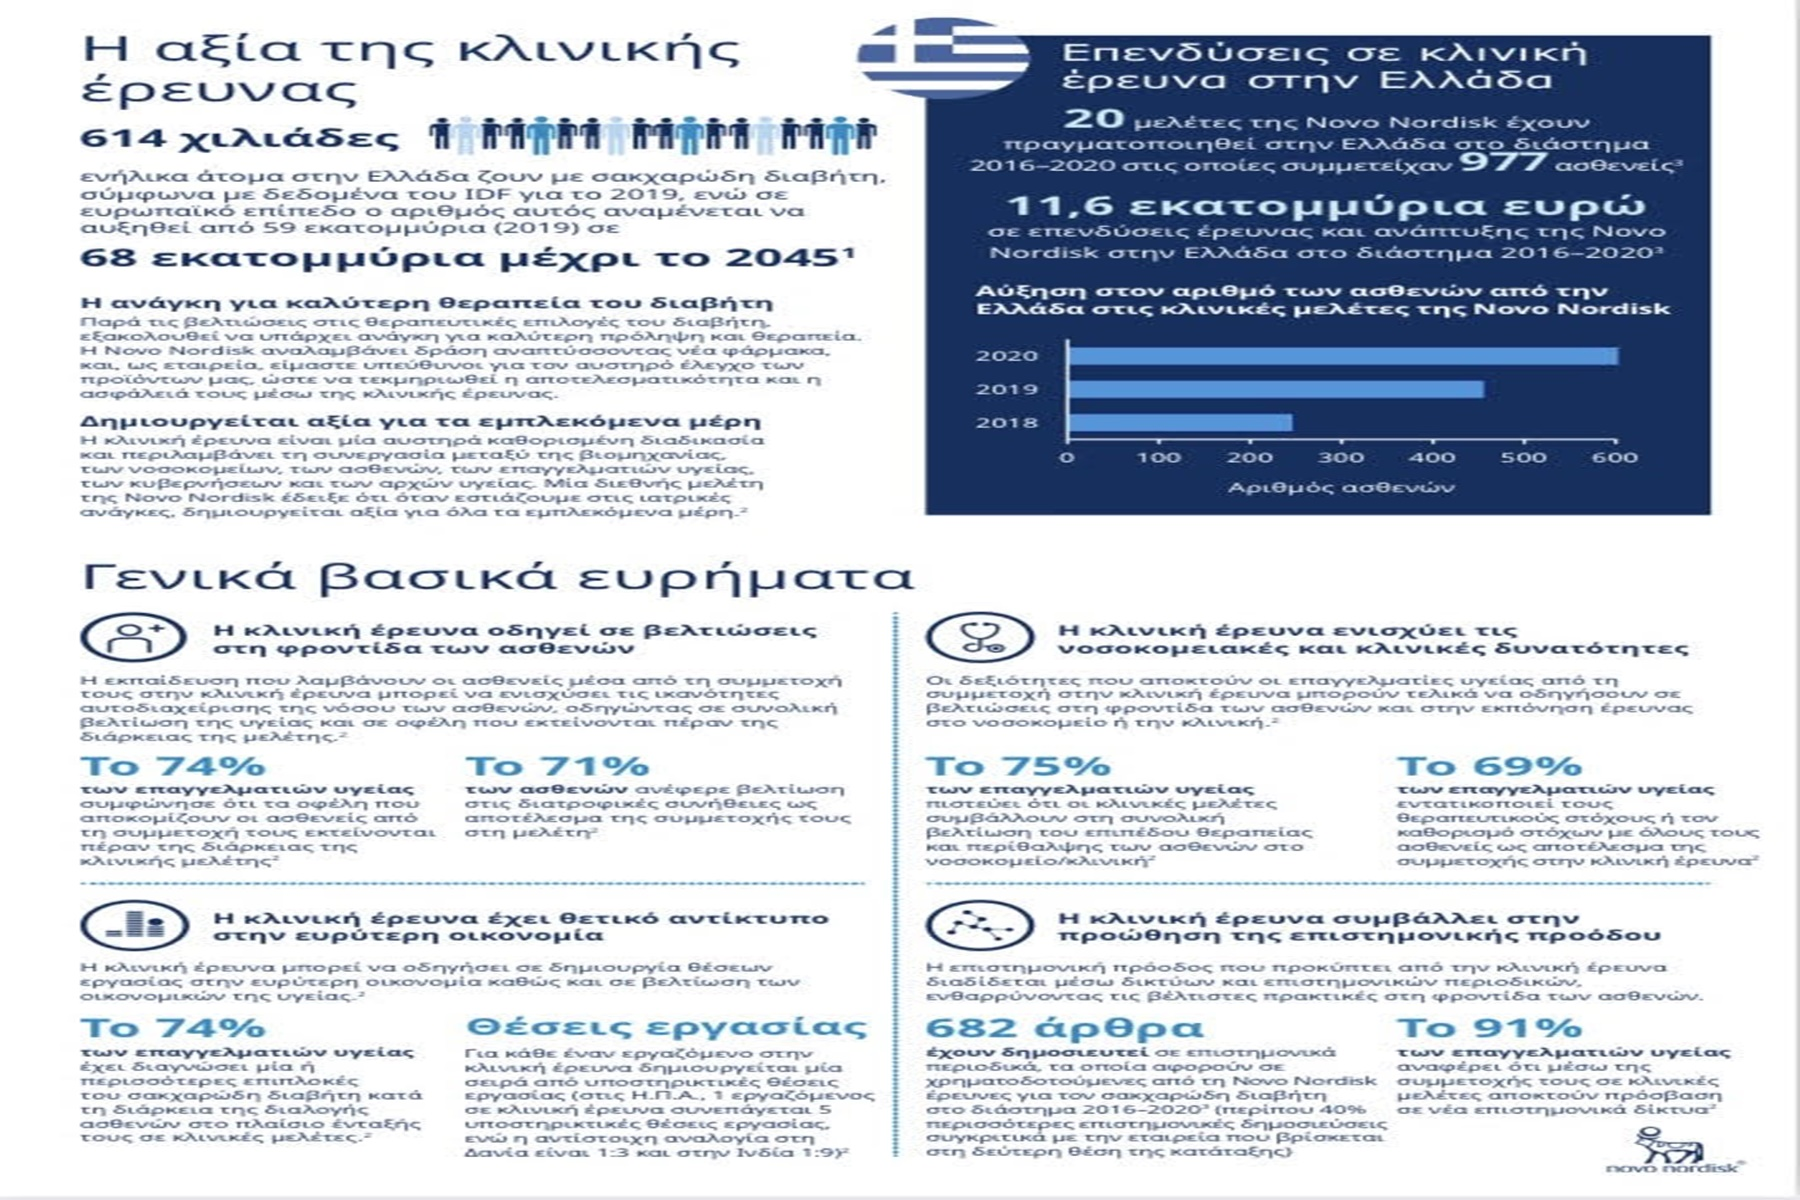 Novo Nordisk Hellas: Τα οφέλη των κλινικών μελετών στην Ελλάδα